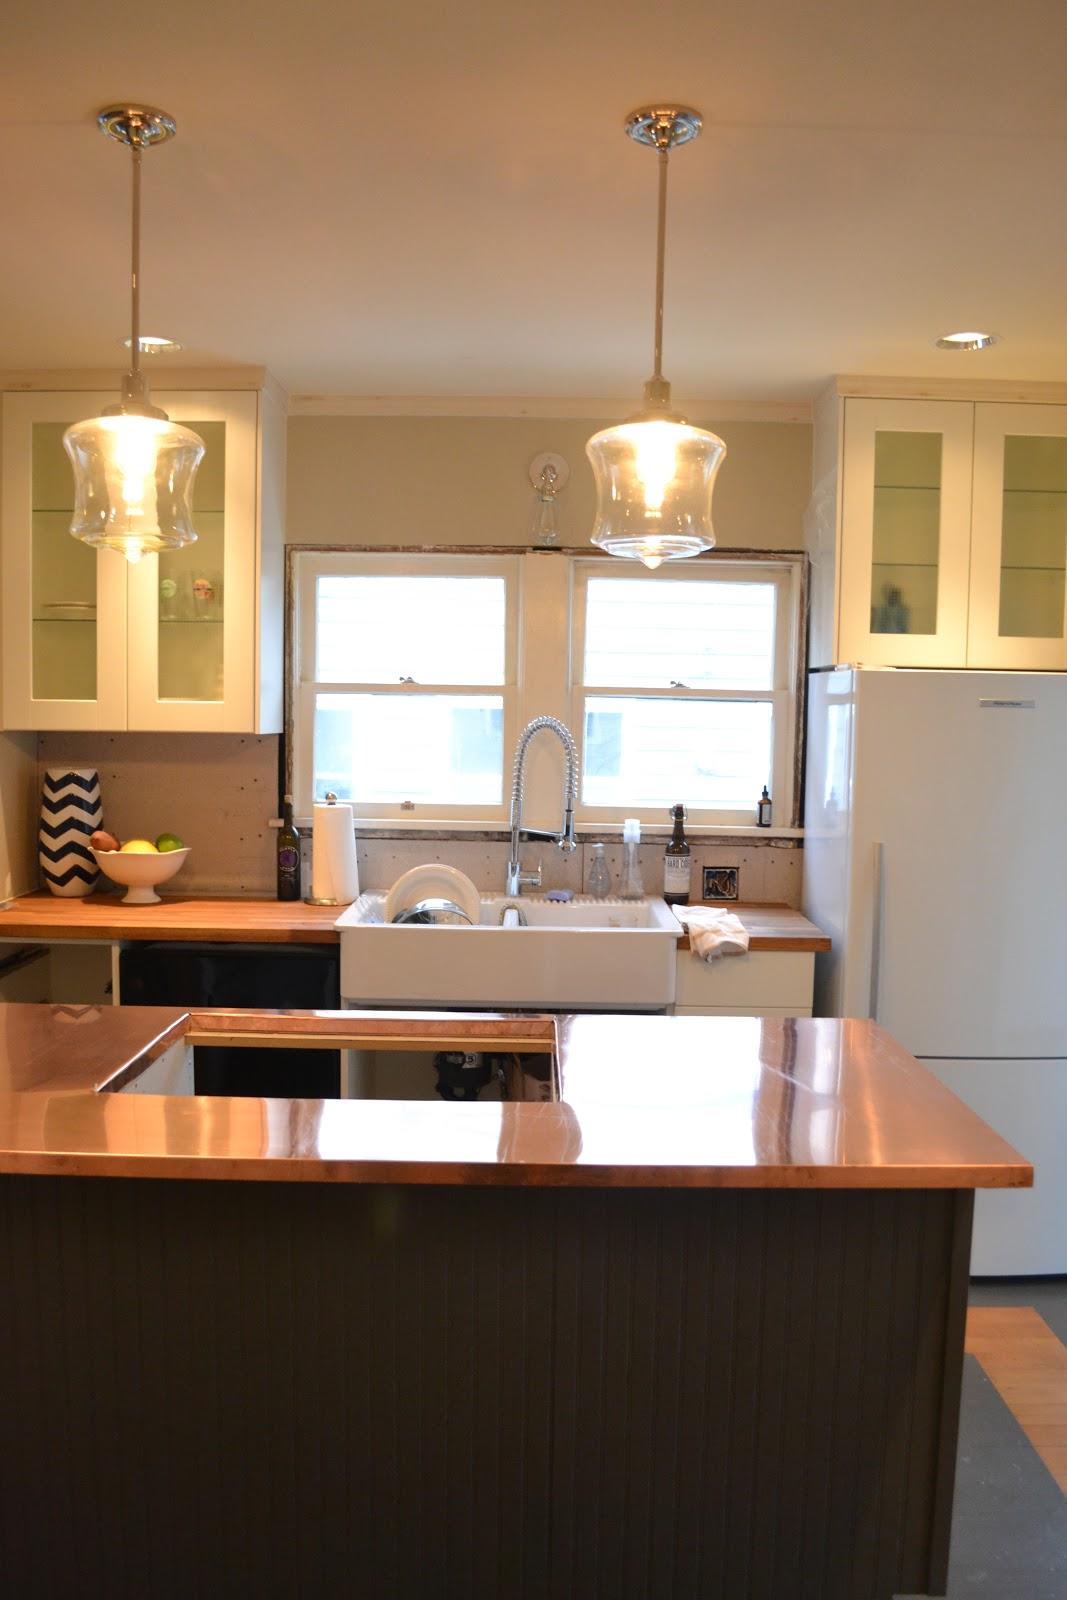 Popular Kitchen Lighting 2 Pendant Lights Over Sink House Beautifull Living Rooms Ideas